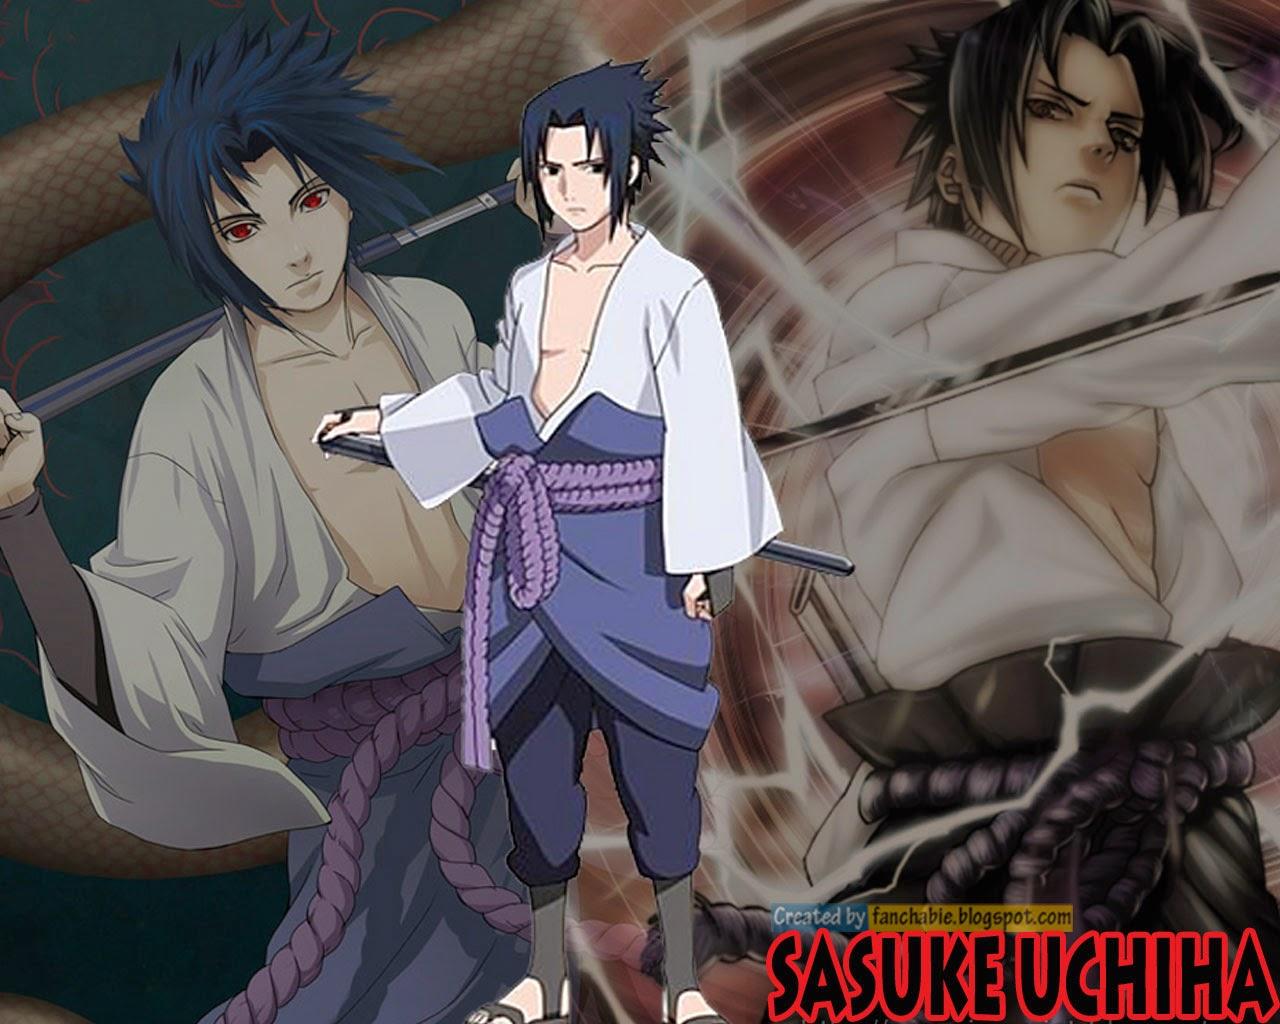 Sasuke With Sword Nagasaki